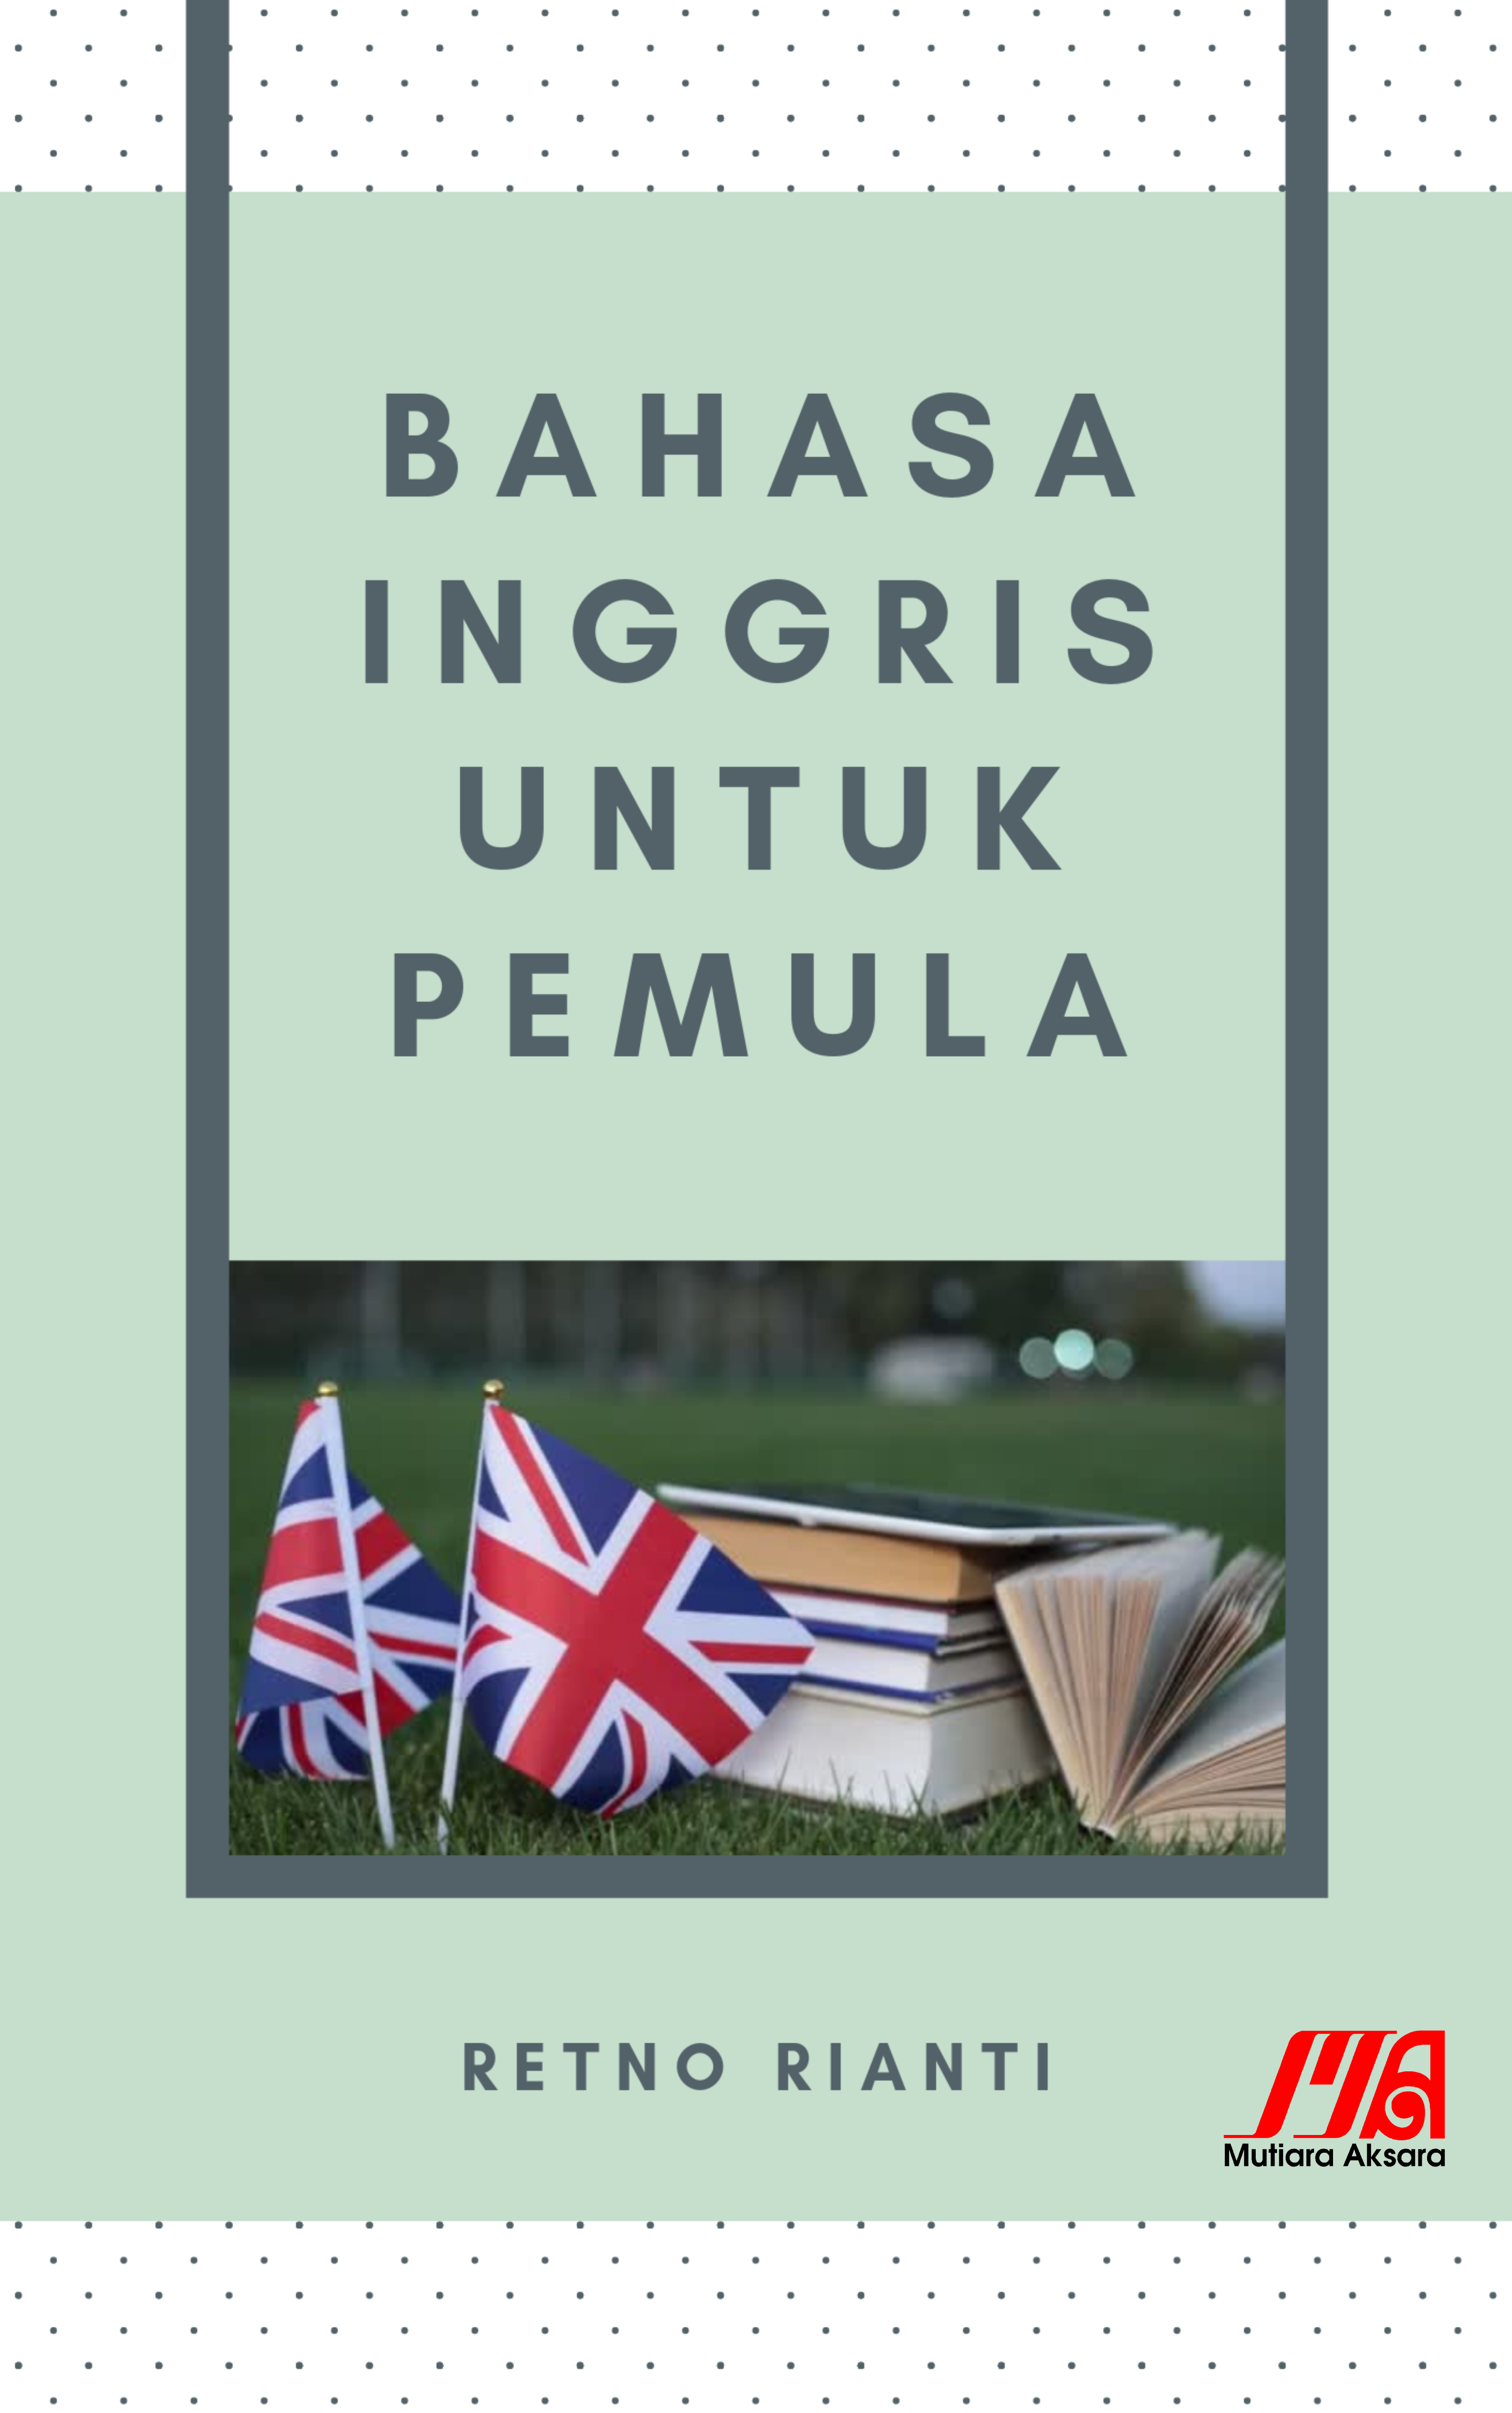 Bahasa Inggris untuk pemula [sumber elektronis]